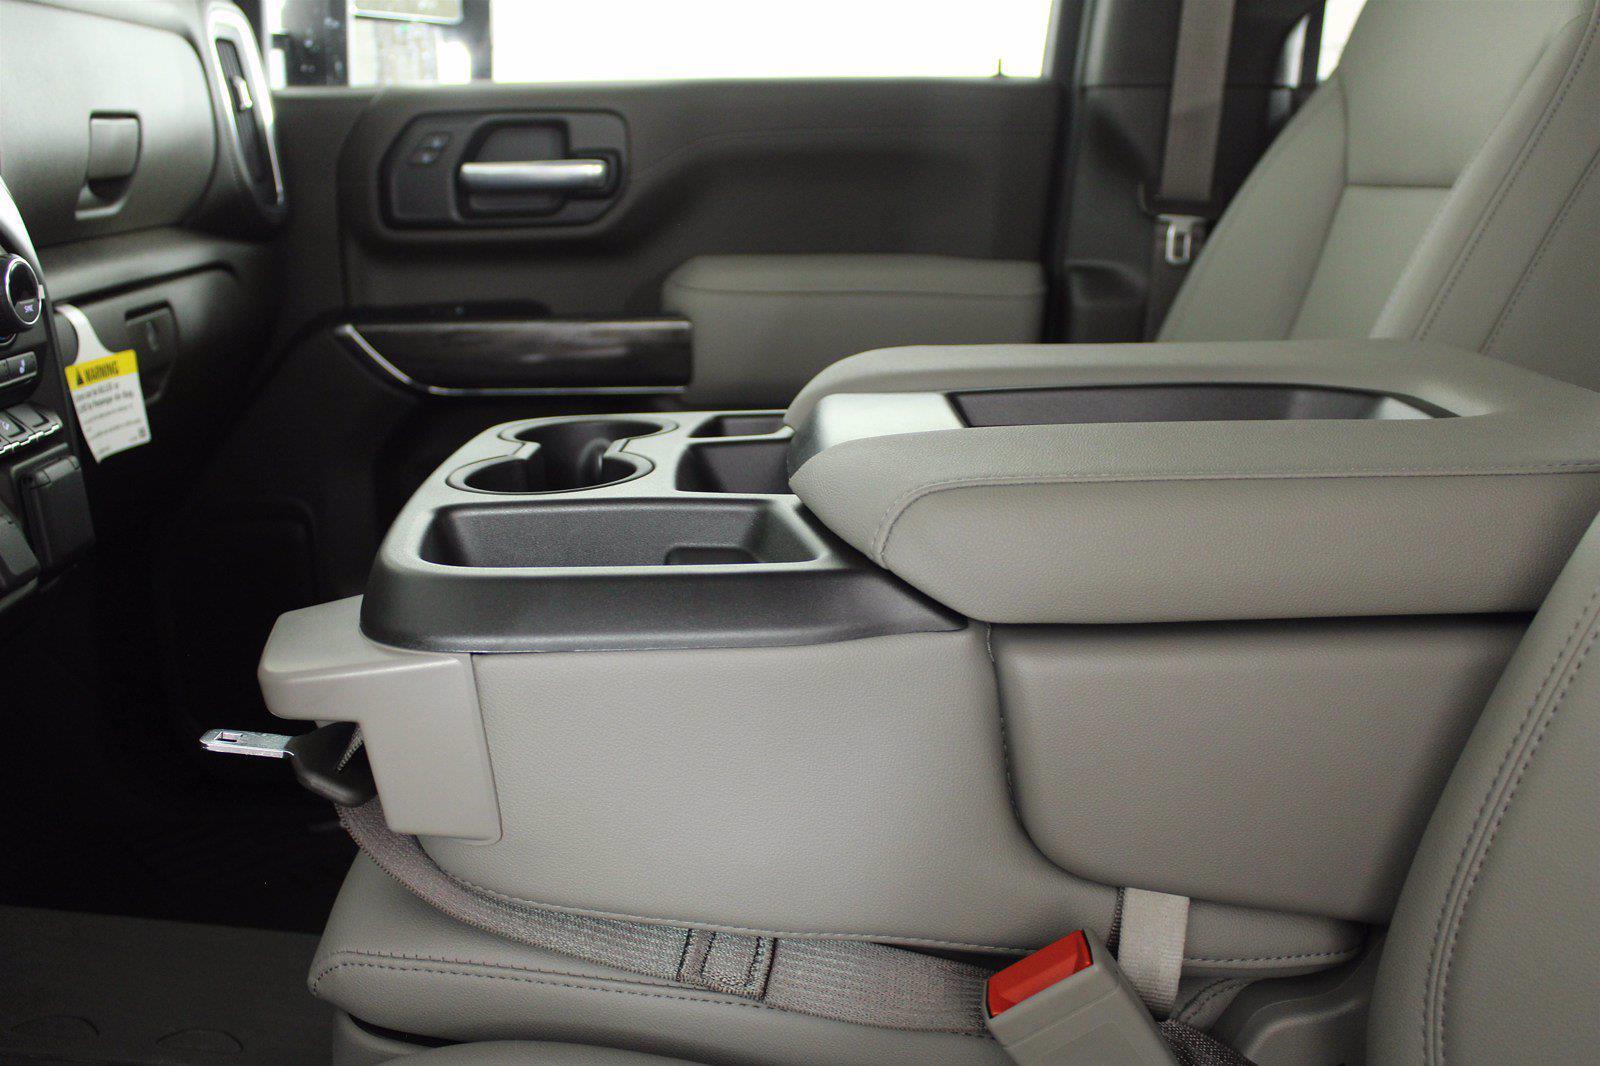 2021 Chevrolet Silverado 2500 Crew Cab 4x4, Pickup #D111097 - photo 12